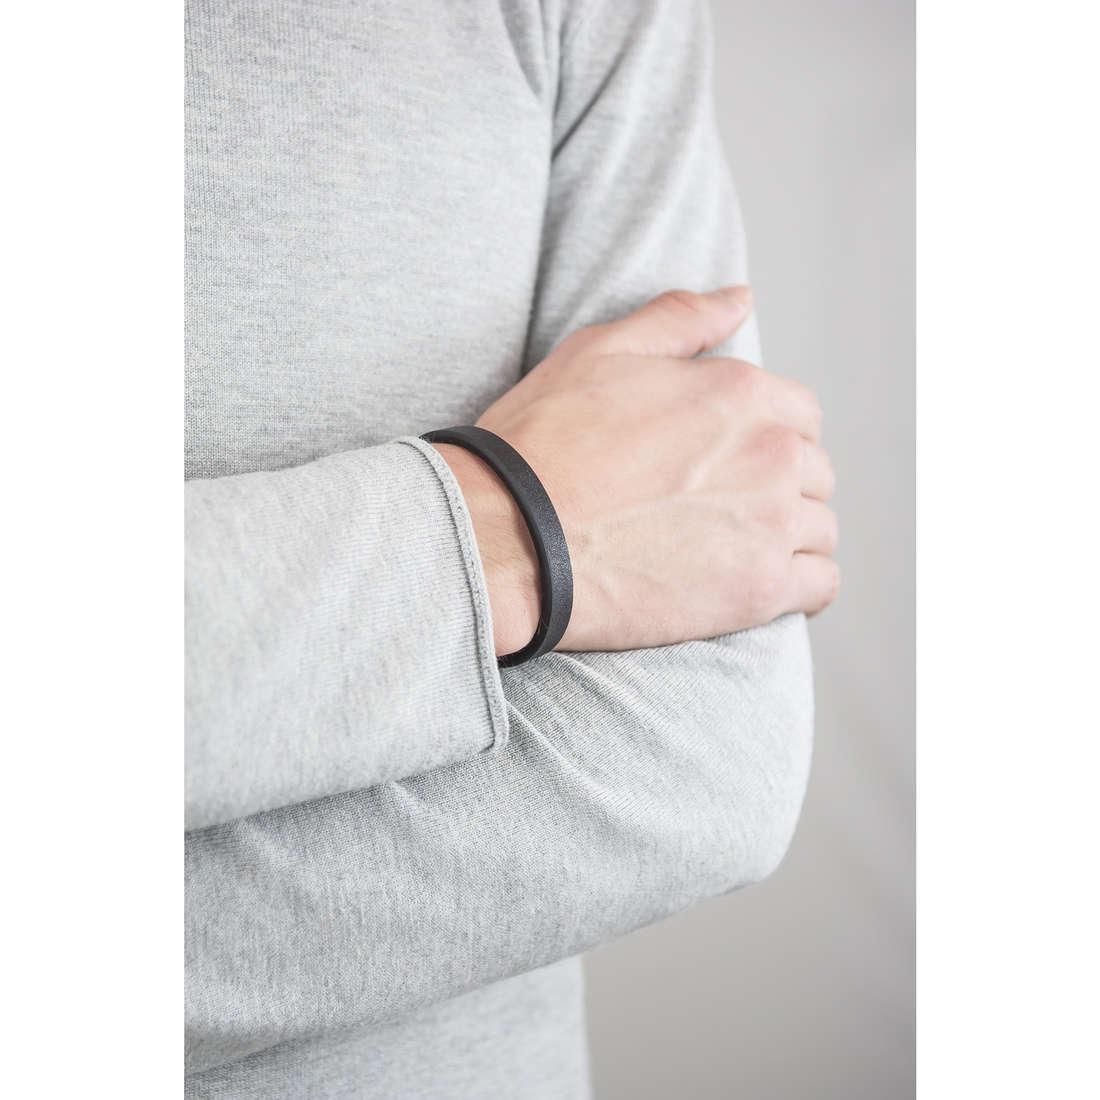 Sector bracciali Bandy uomo SZV11 indosso